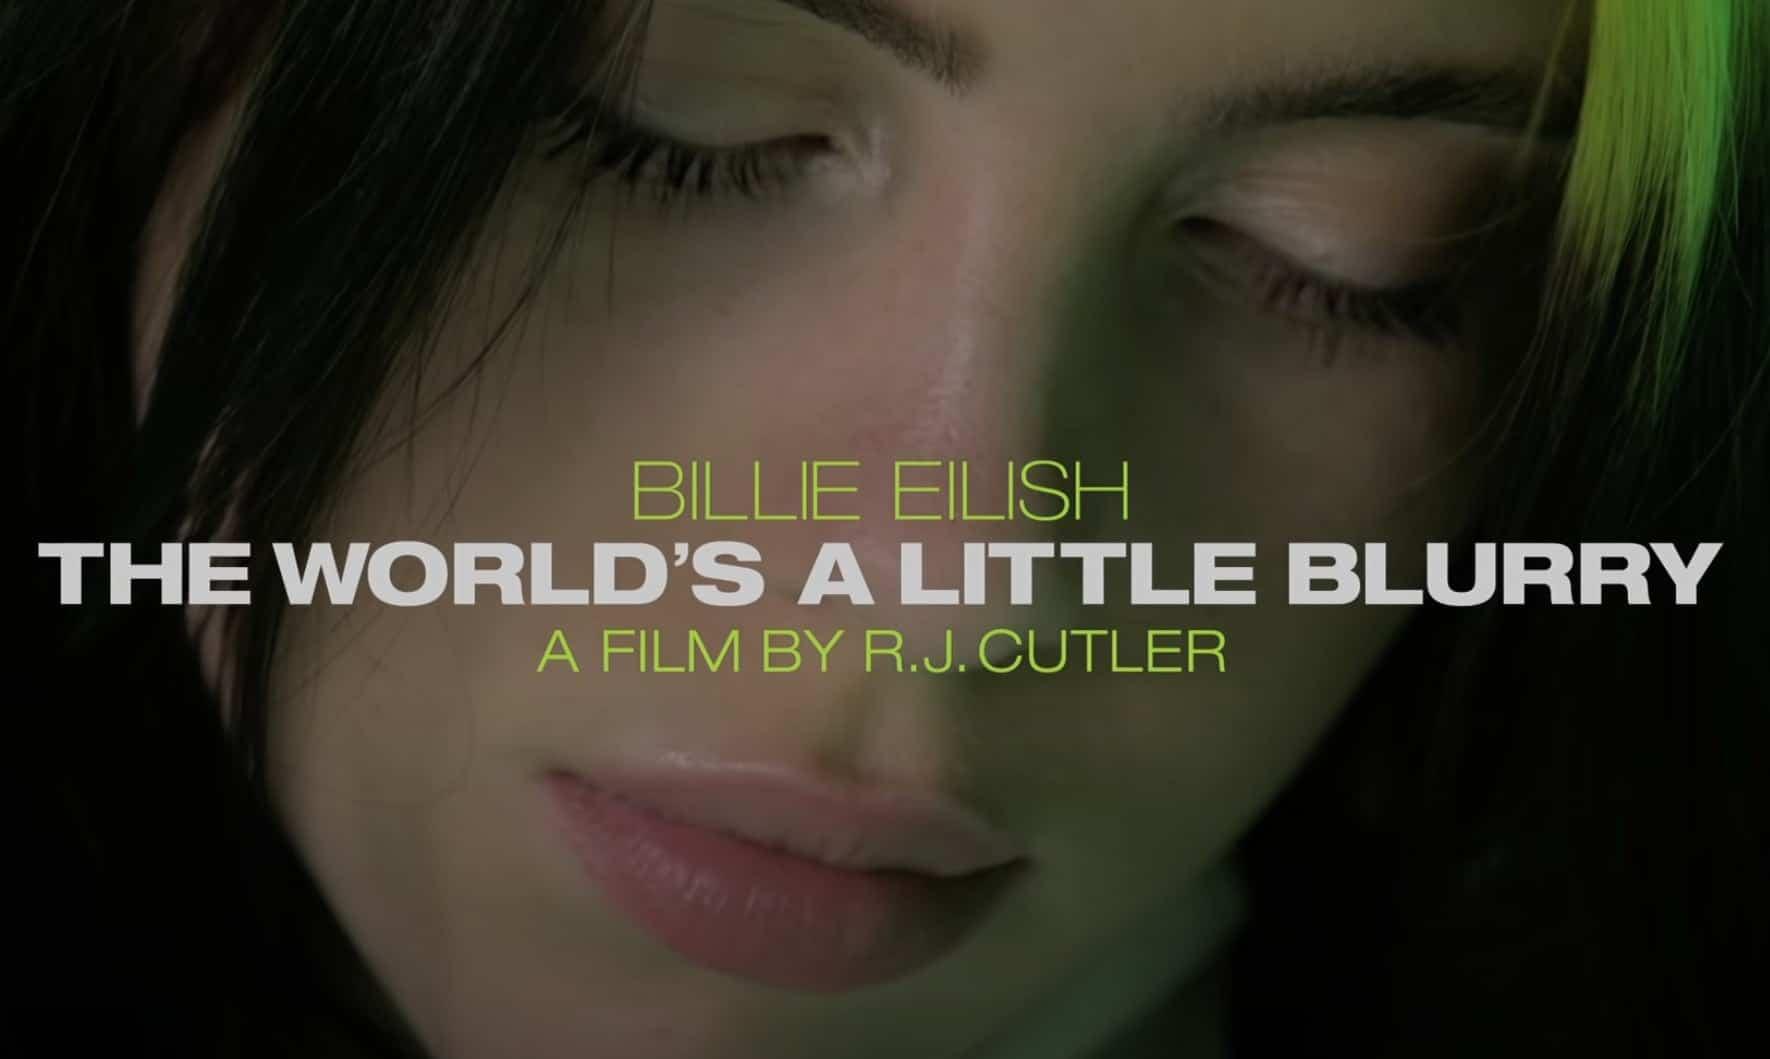 Documentário de Billie Eillish